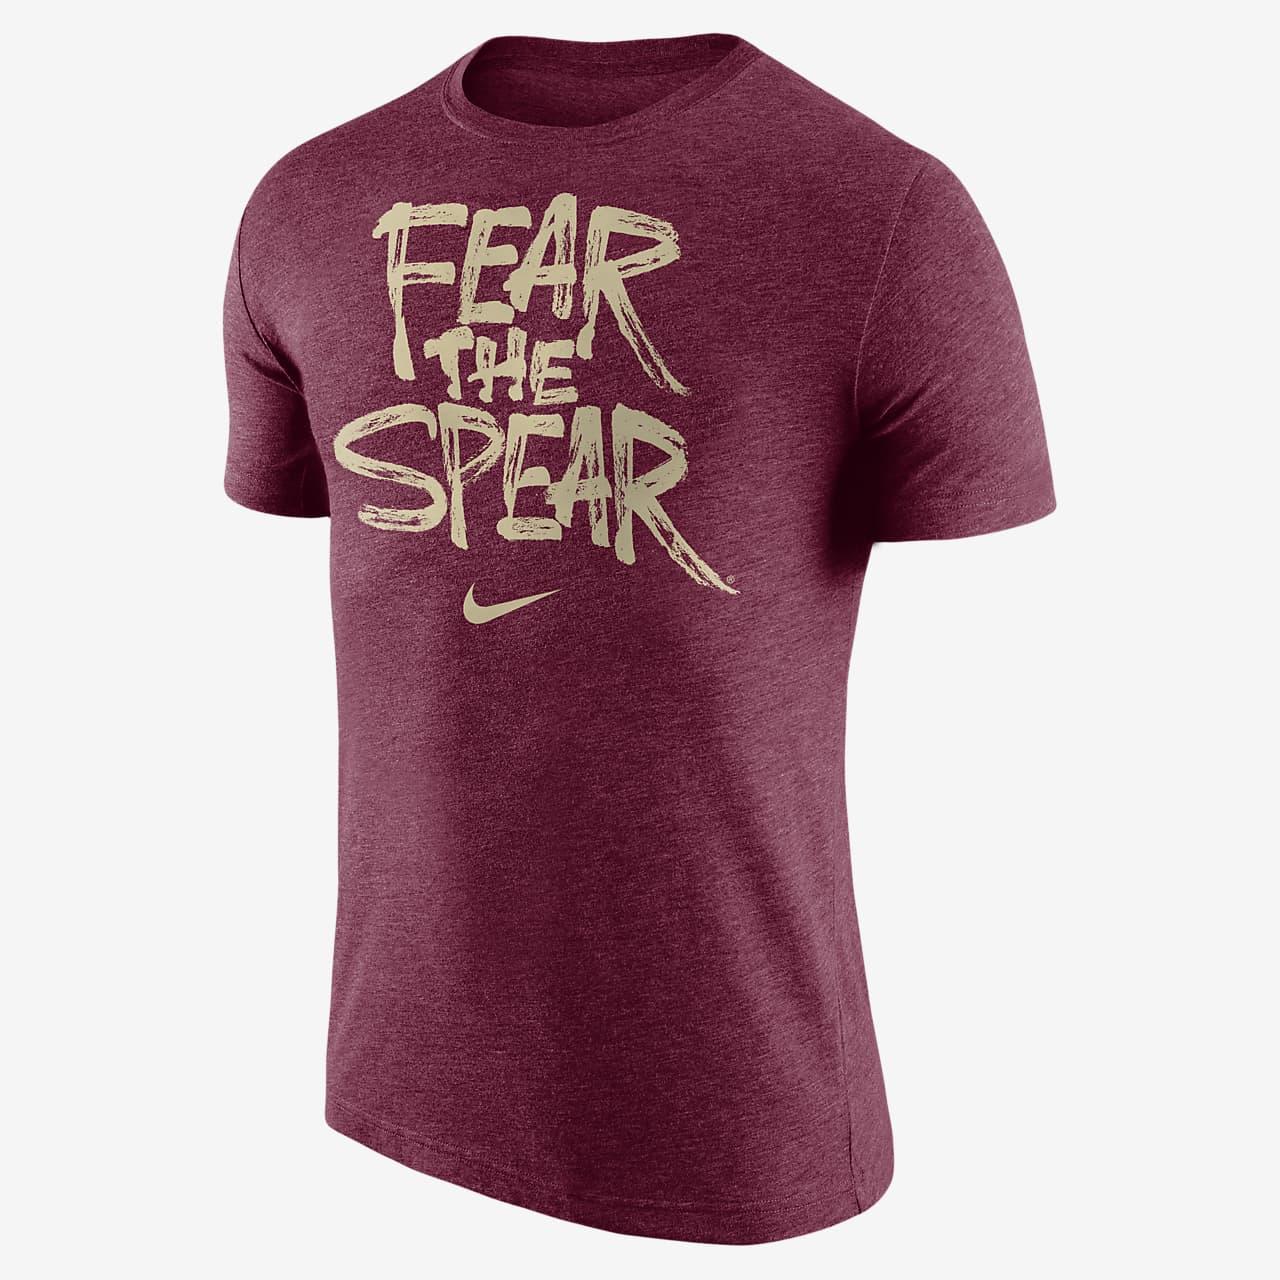 Nike College (Florida State) Men's T-Shirt